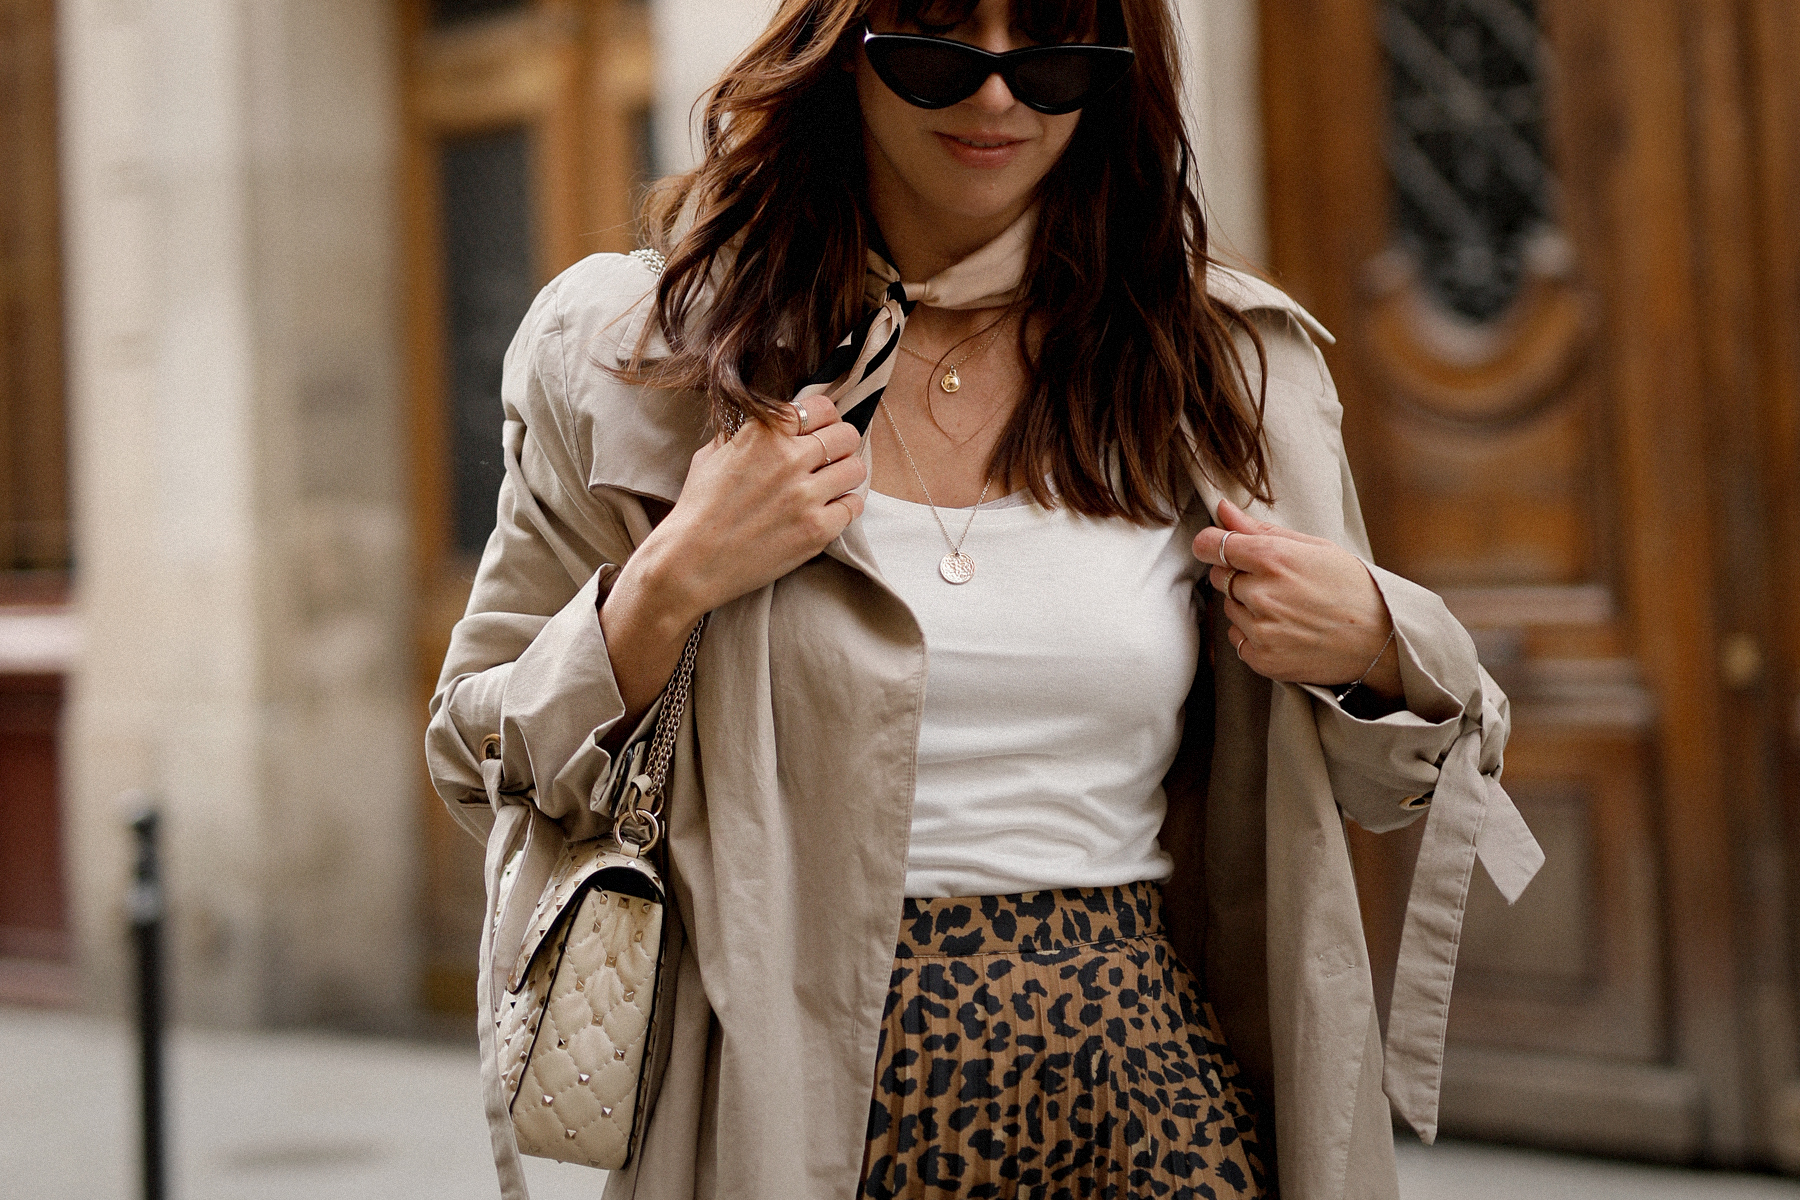 paris love mon amour mint&berry leopard print skirt trench coat valentino rockstud breuninger catsanddogsblog modeblogger styleblog modeblog outfitblog parisienne styliste cats&dogs max bechmann fotografie film düsseldorf 1